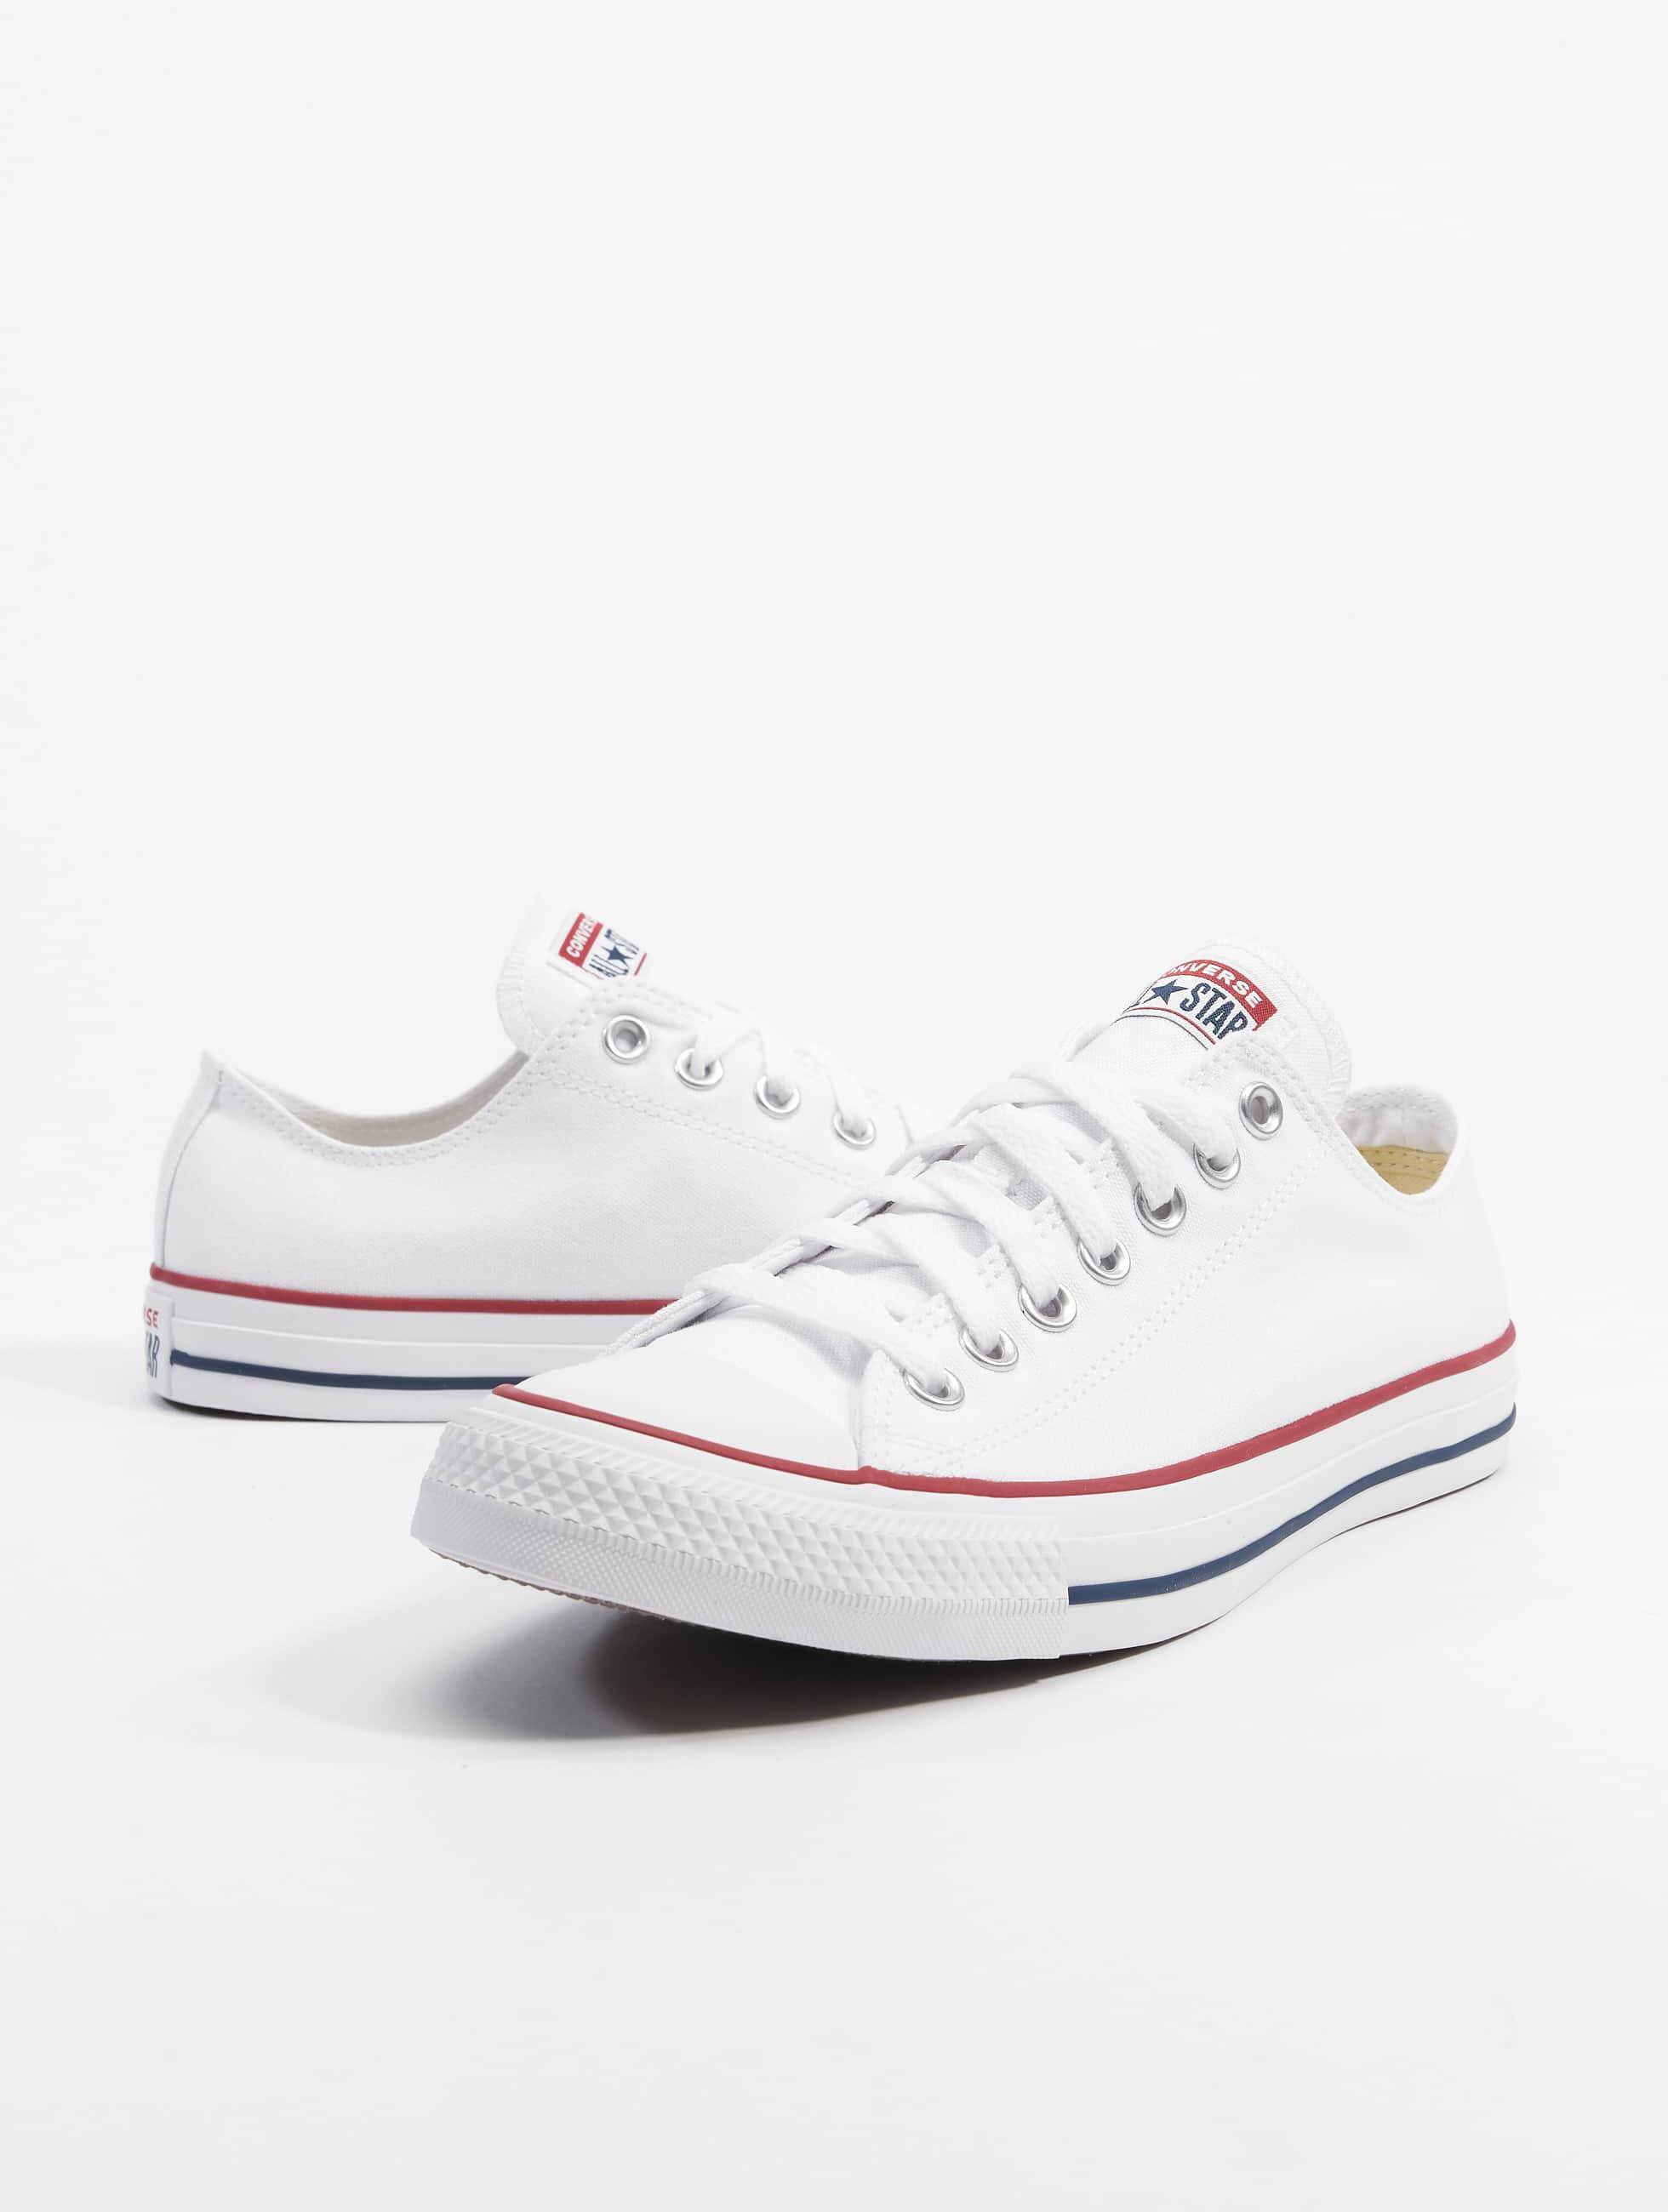 Converse | All Star Ox Canvas blanc Baskets 122836